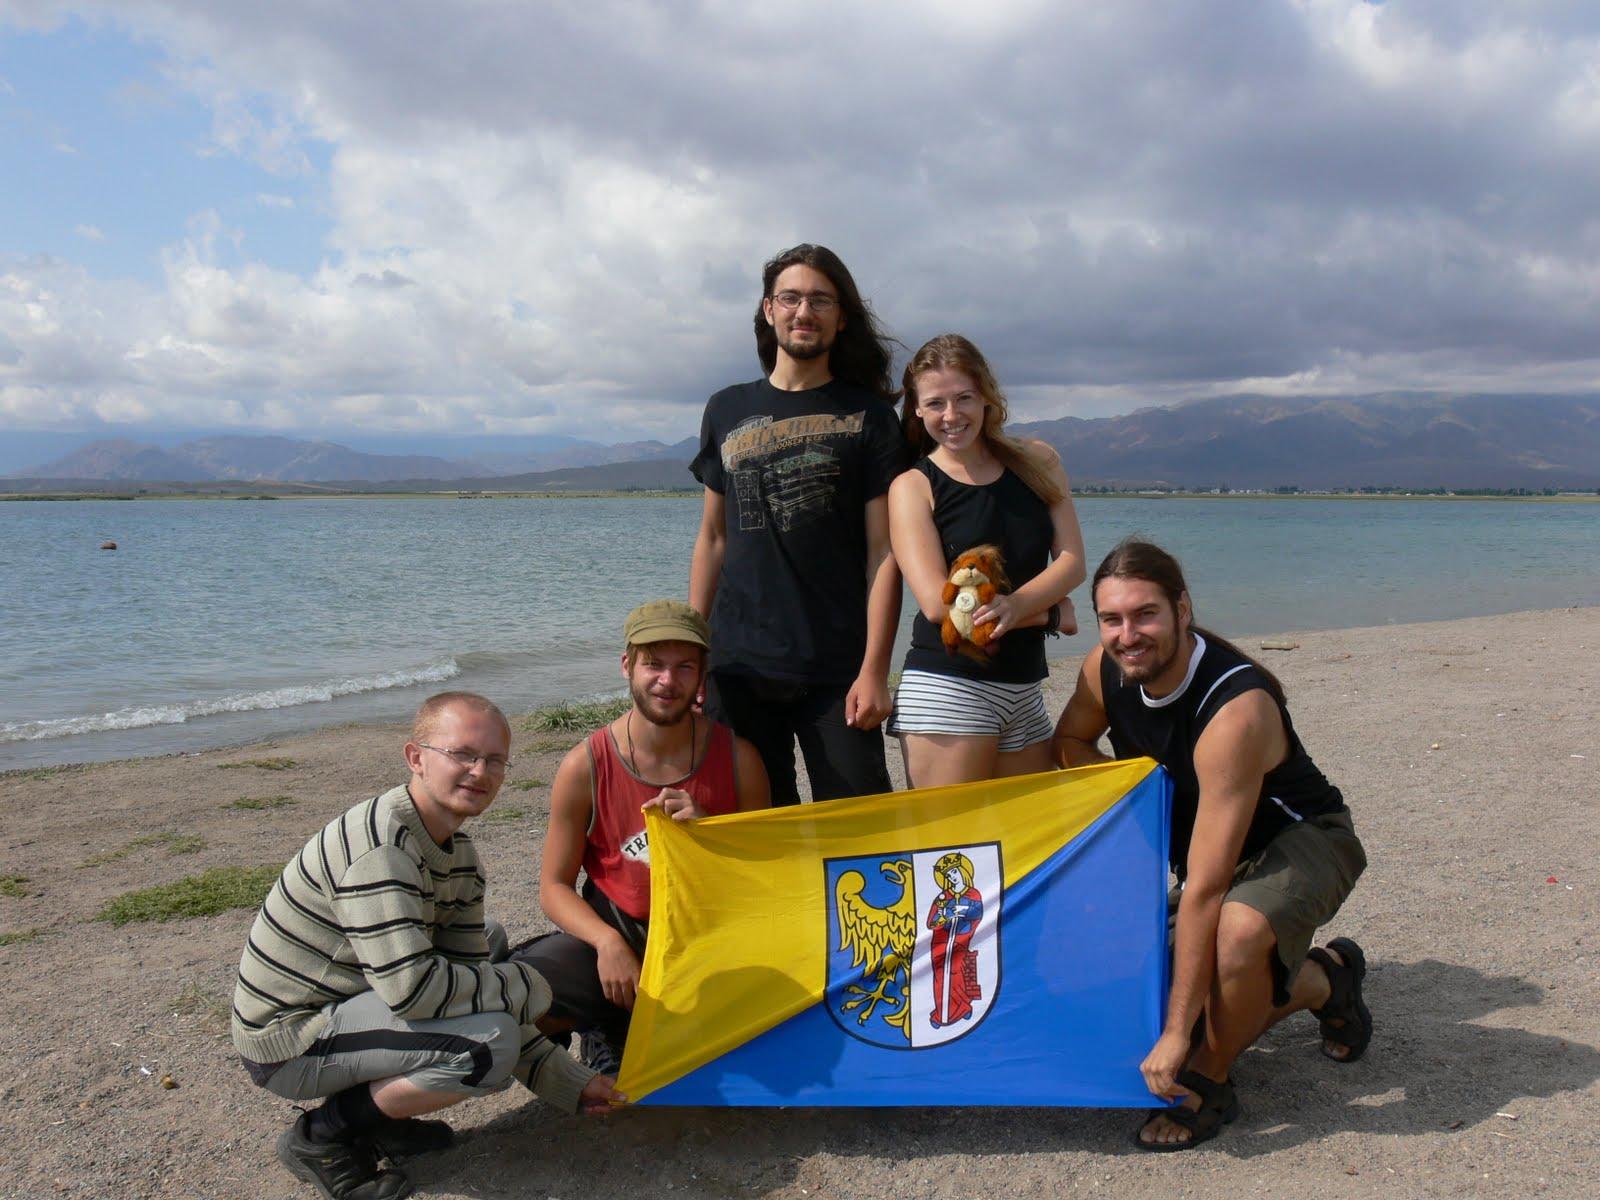 Jezioro Issyk-Kol, Kirgistan